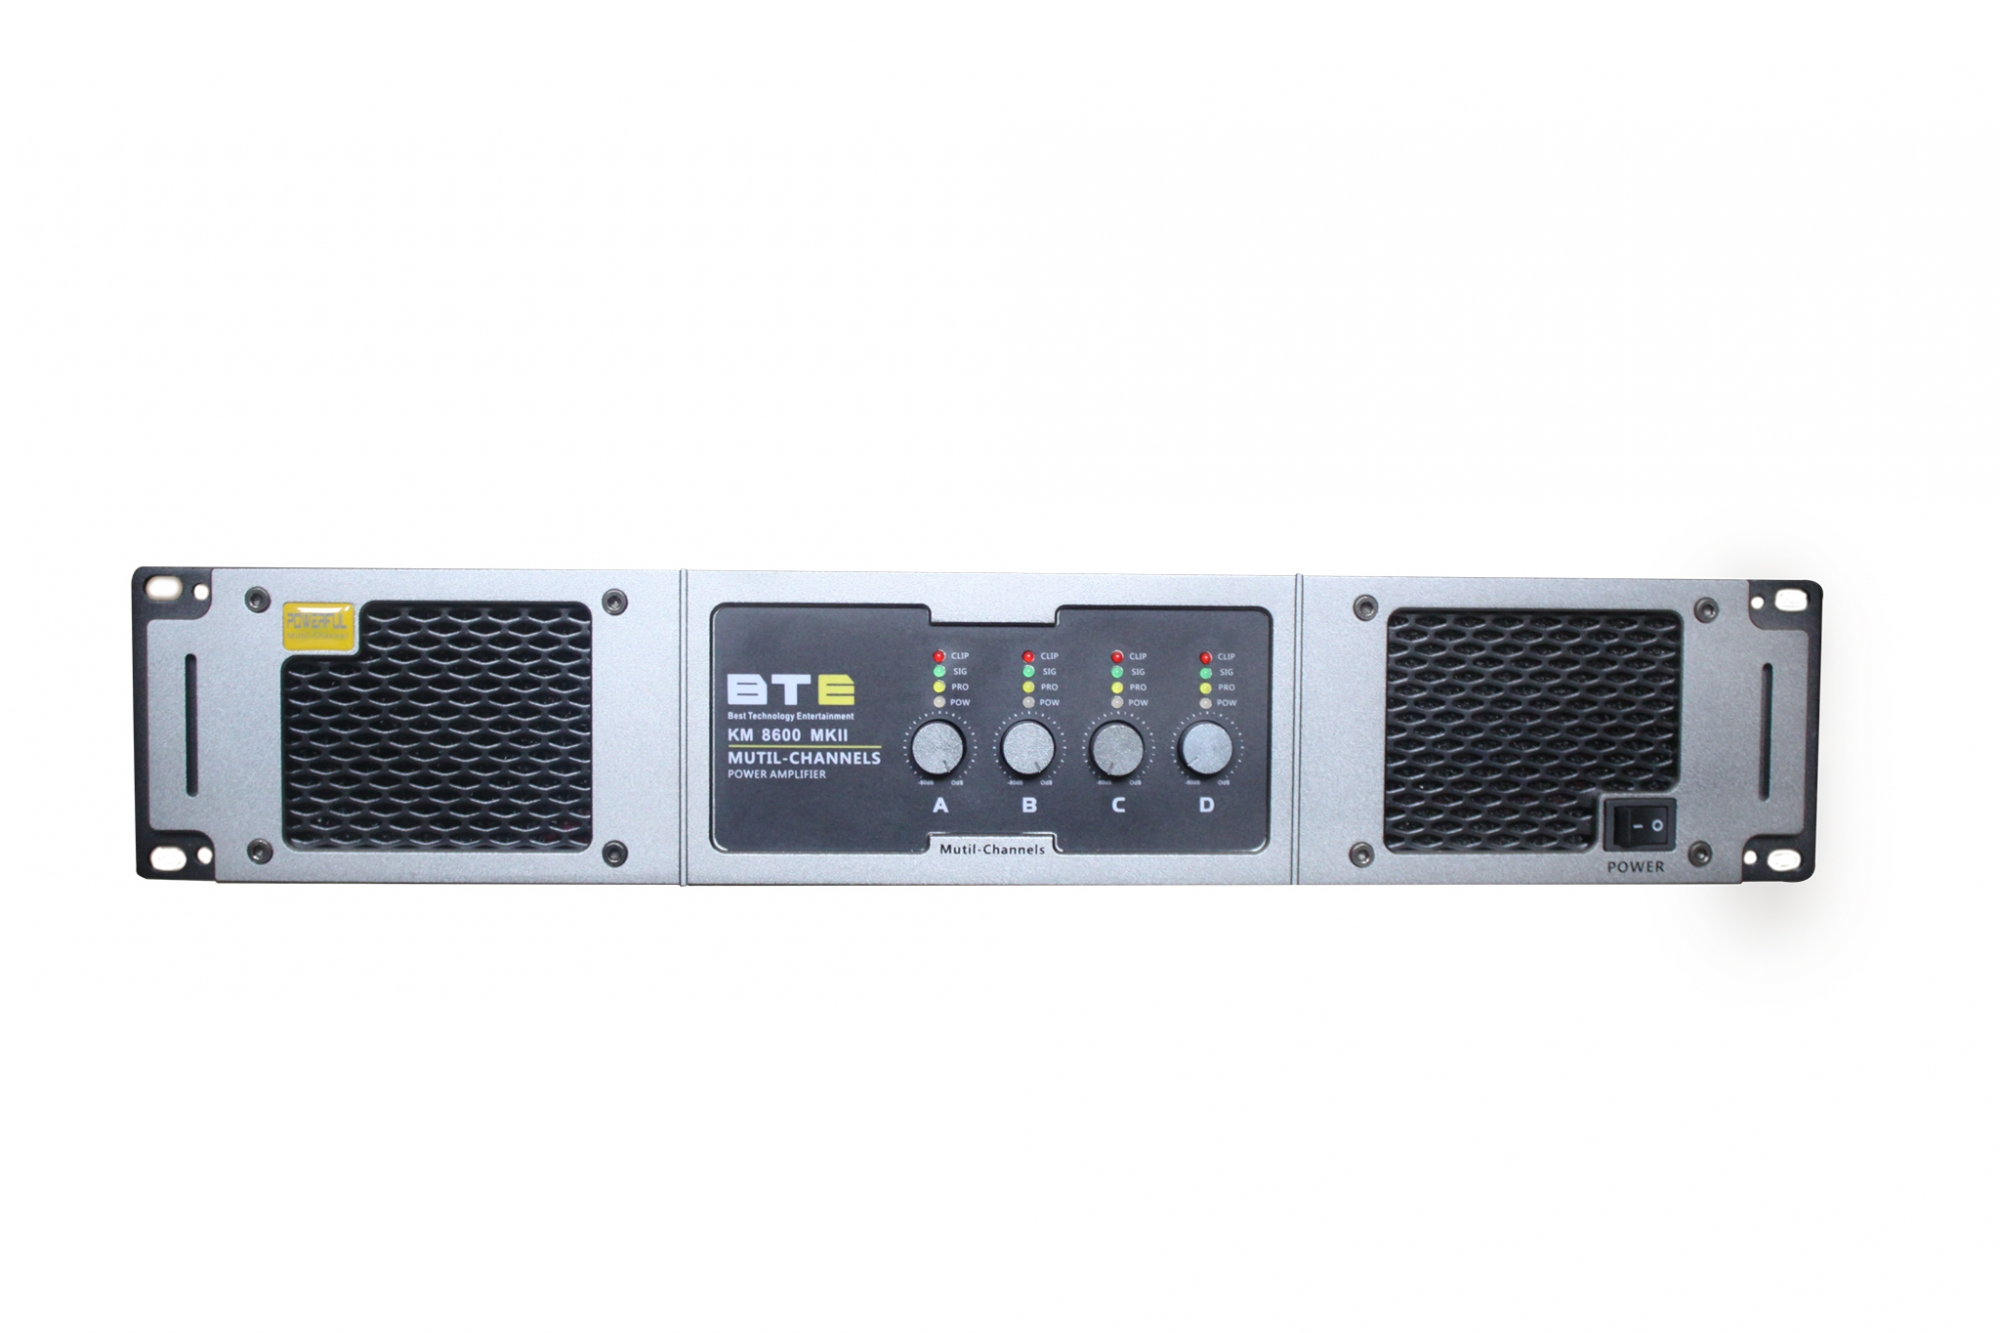 Công suất BTE KM8600 KII